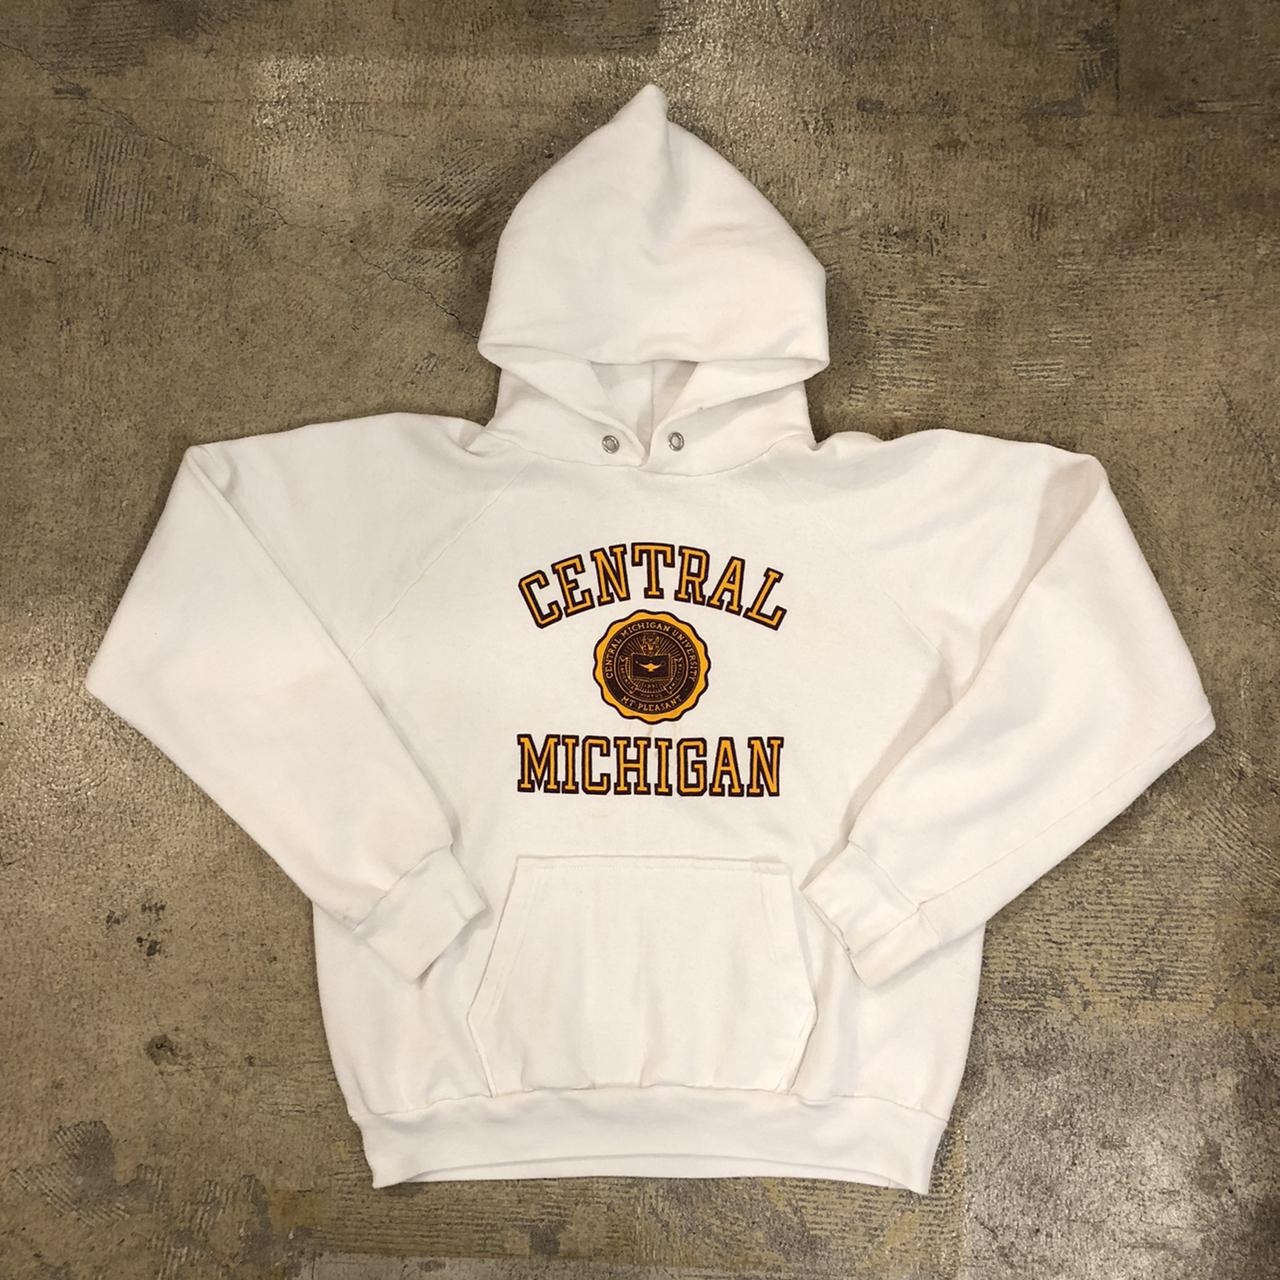 80's Champion Central Michigan Hoodie ¥8,800+tax